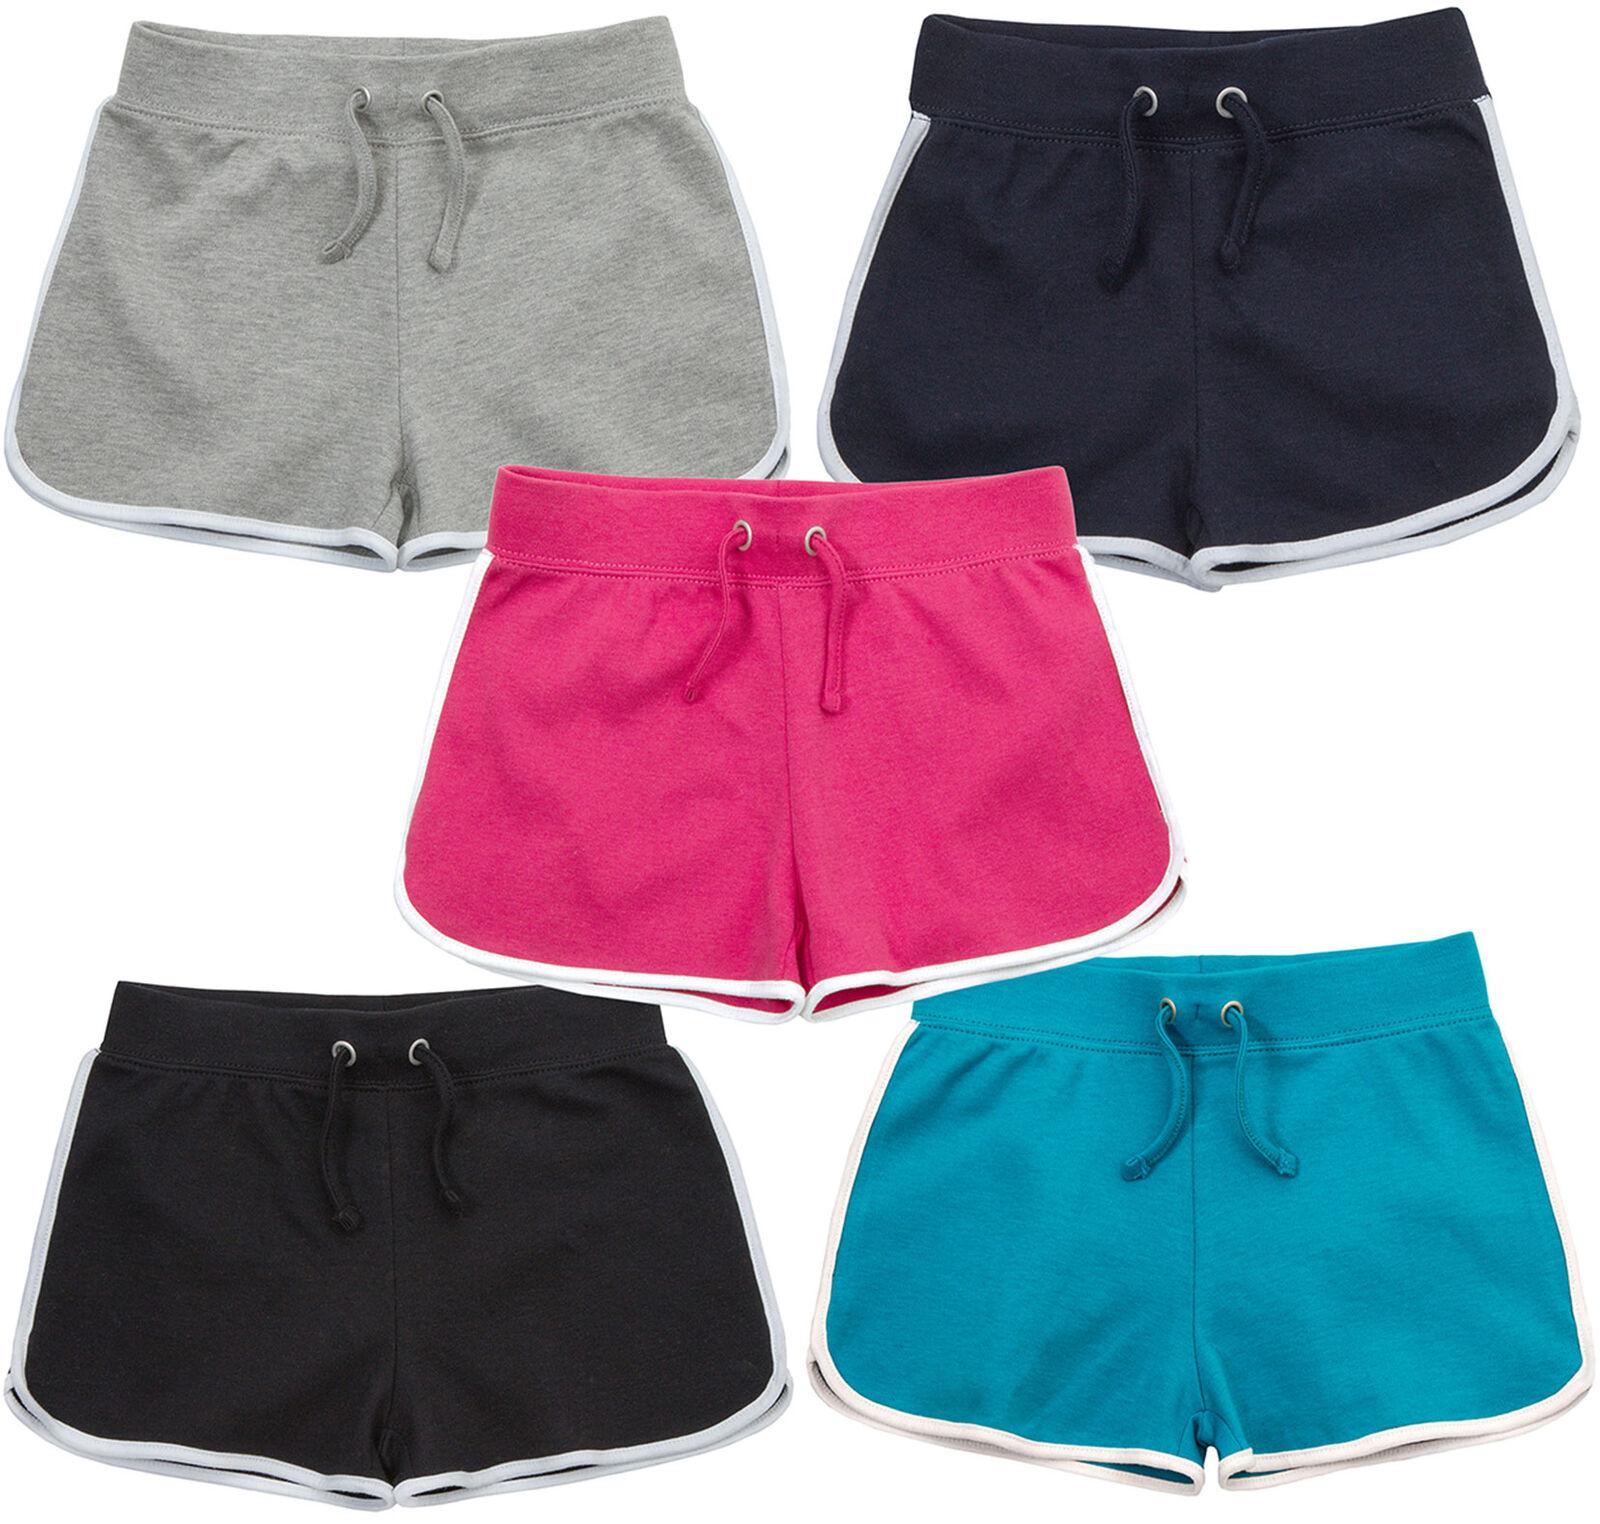 Girls Summer Shorts Cotton Plain Jersey Shorts Black Navy Grey Pink